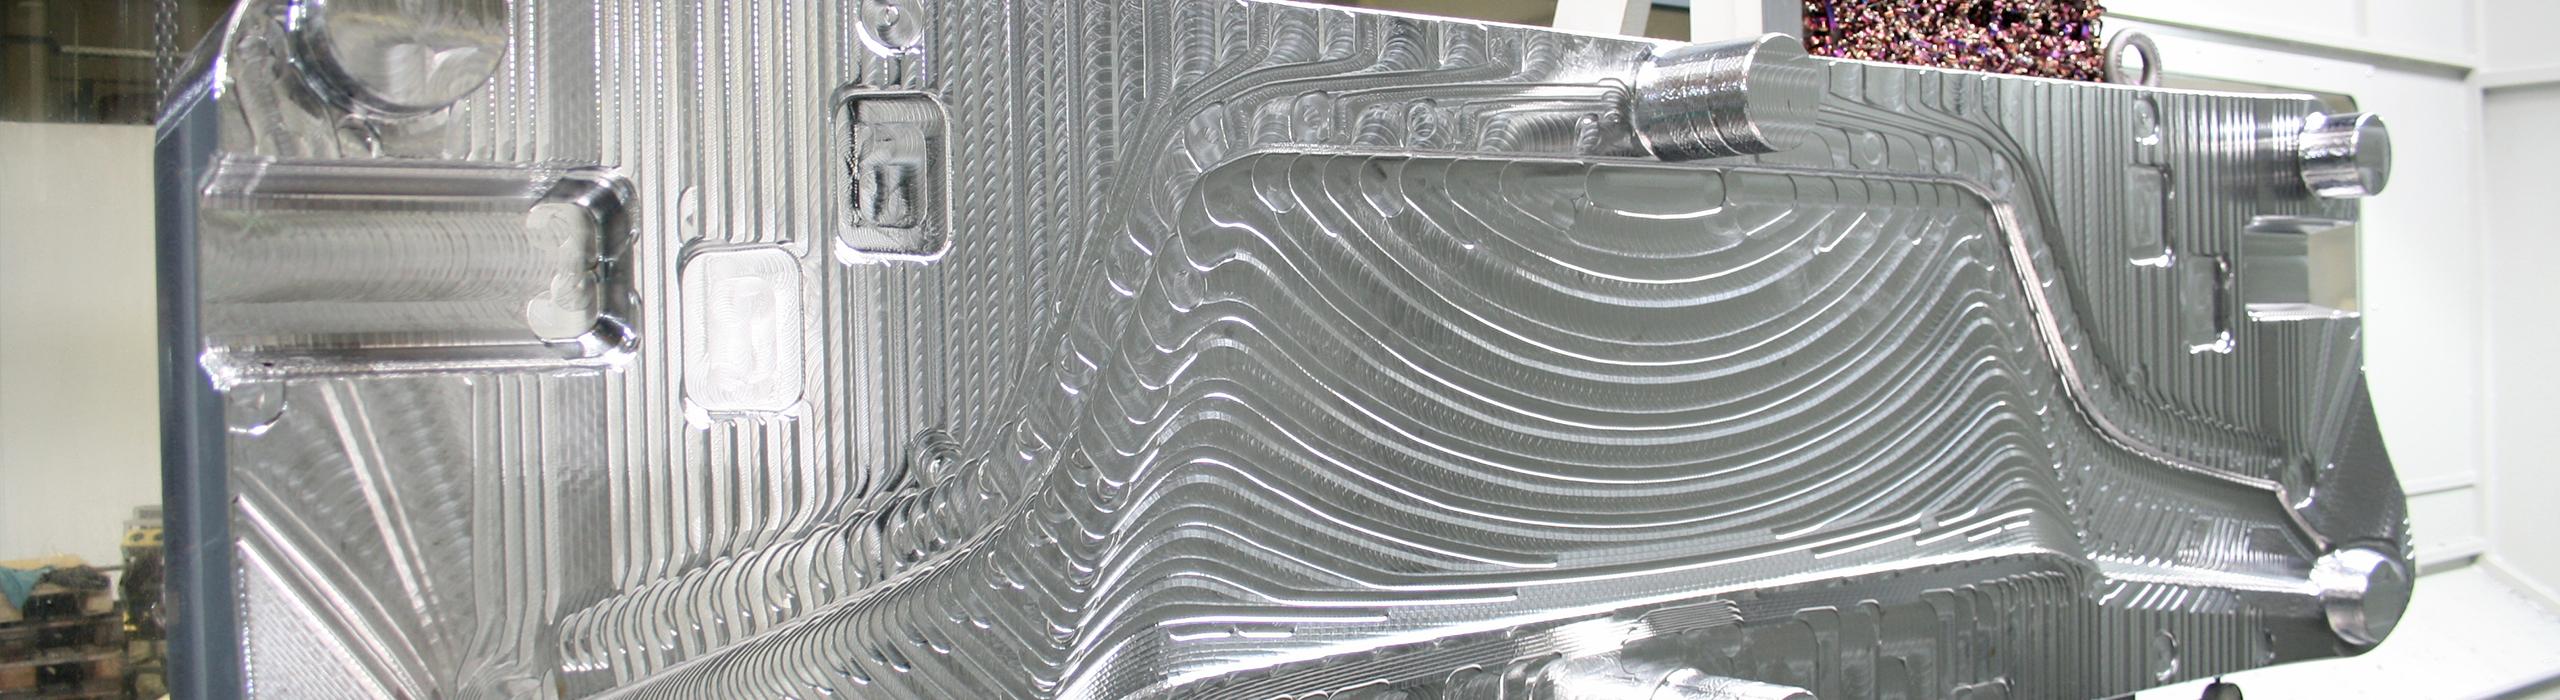 RSB-Stahl-vorschruppen-header3